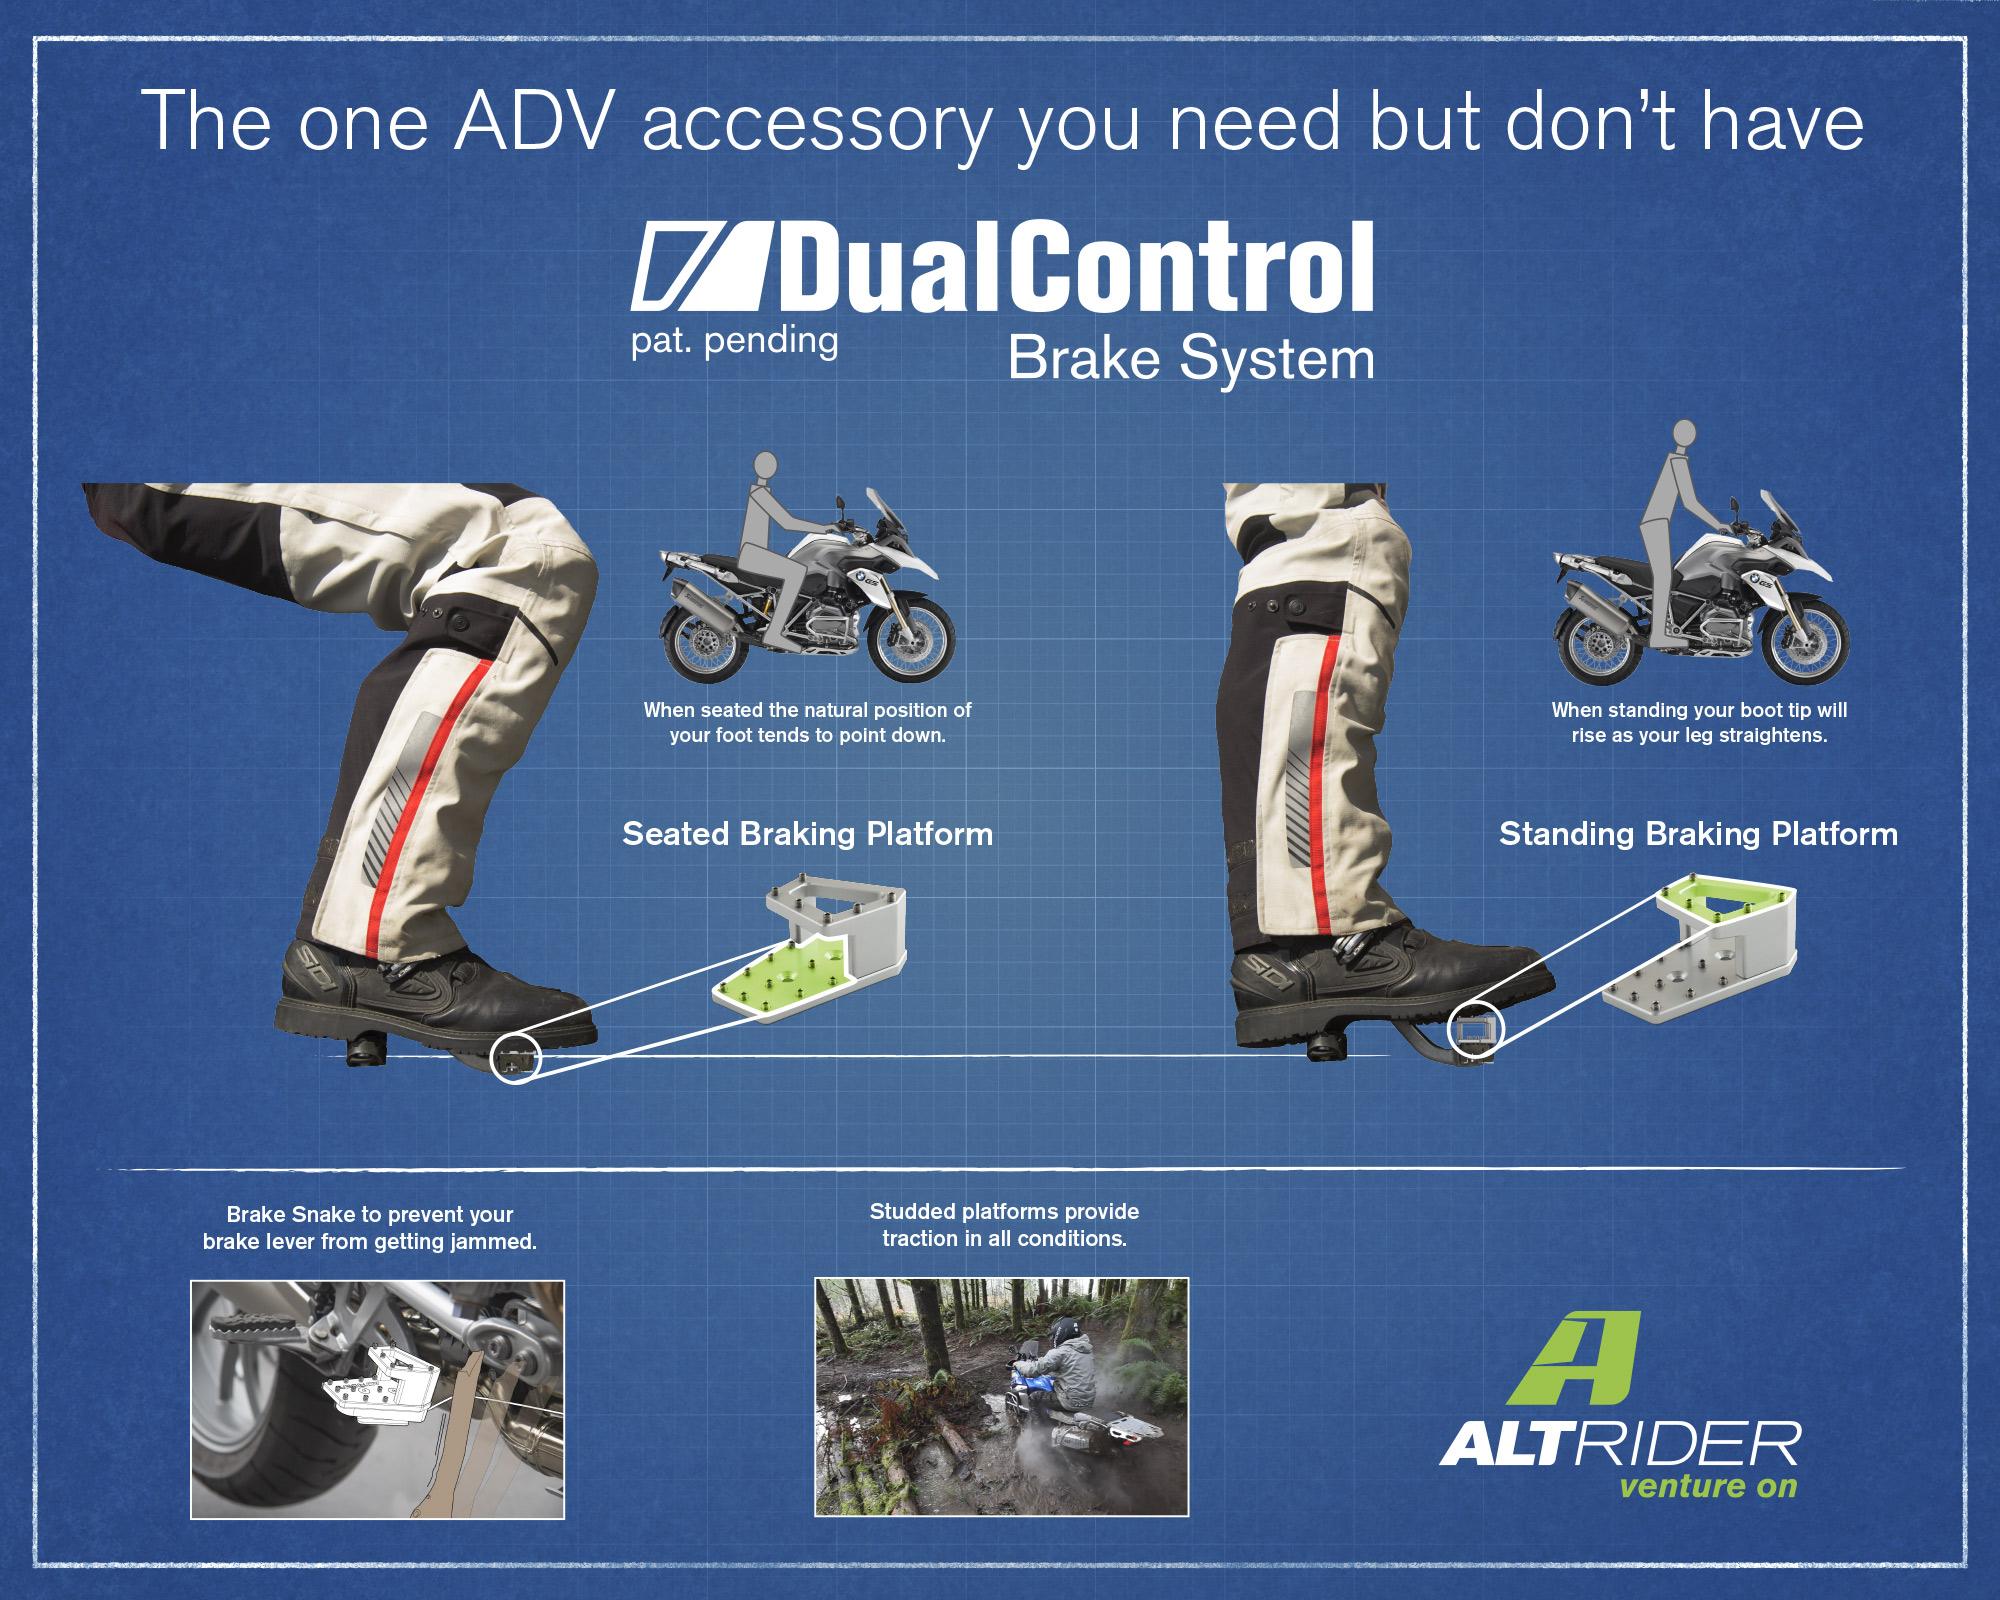 DualControl Brake System poster